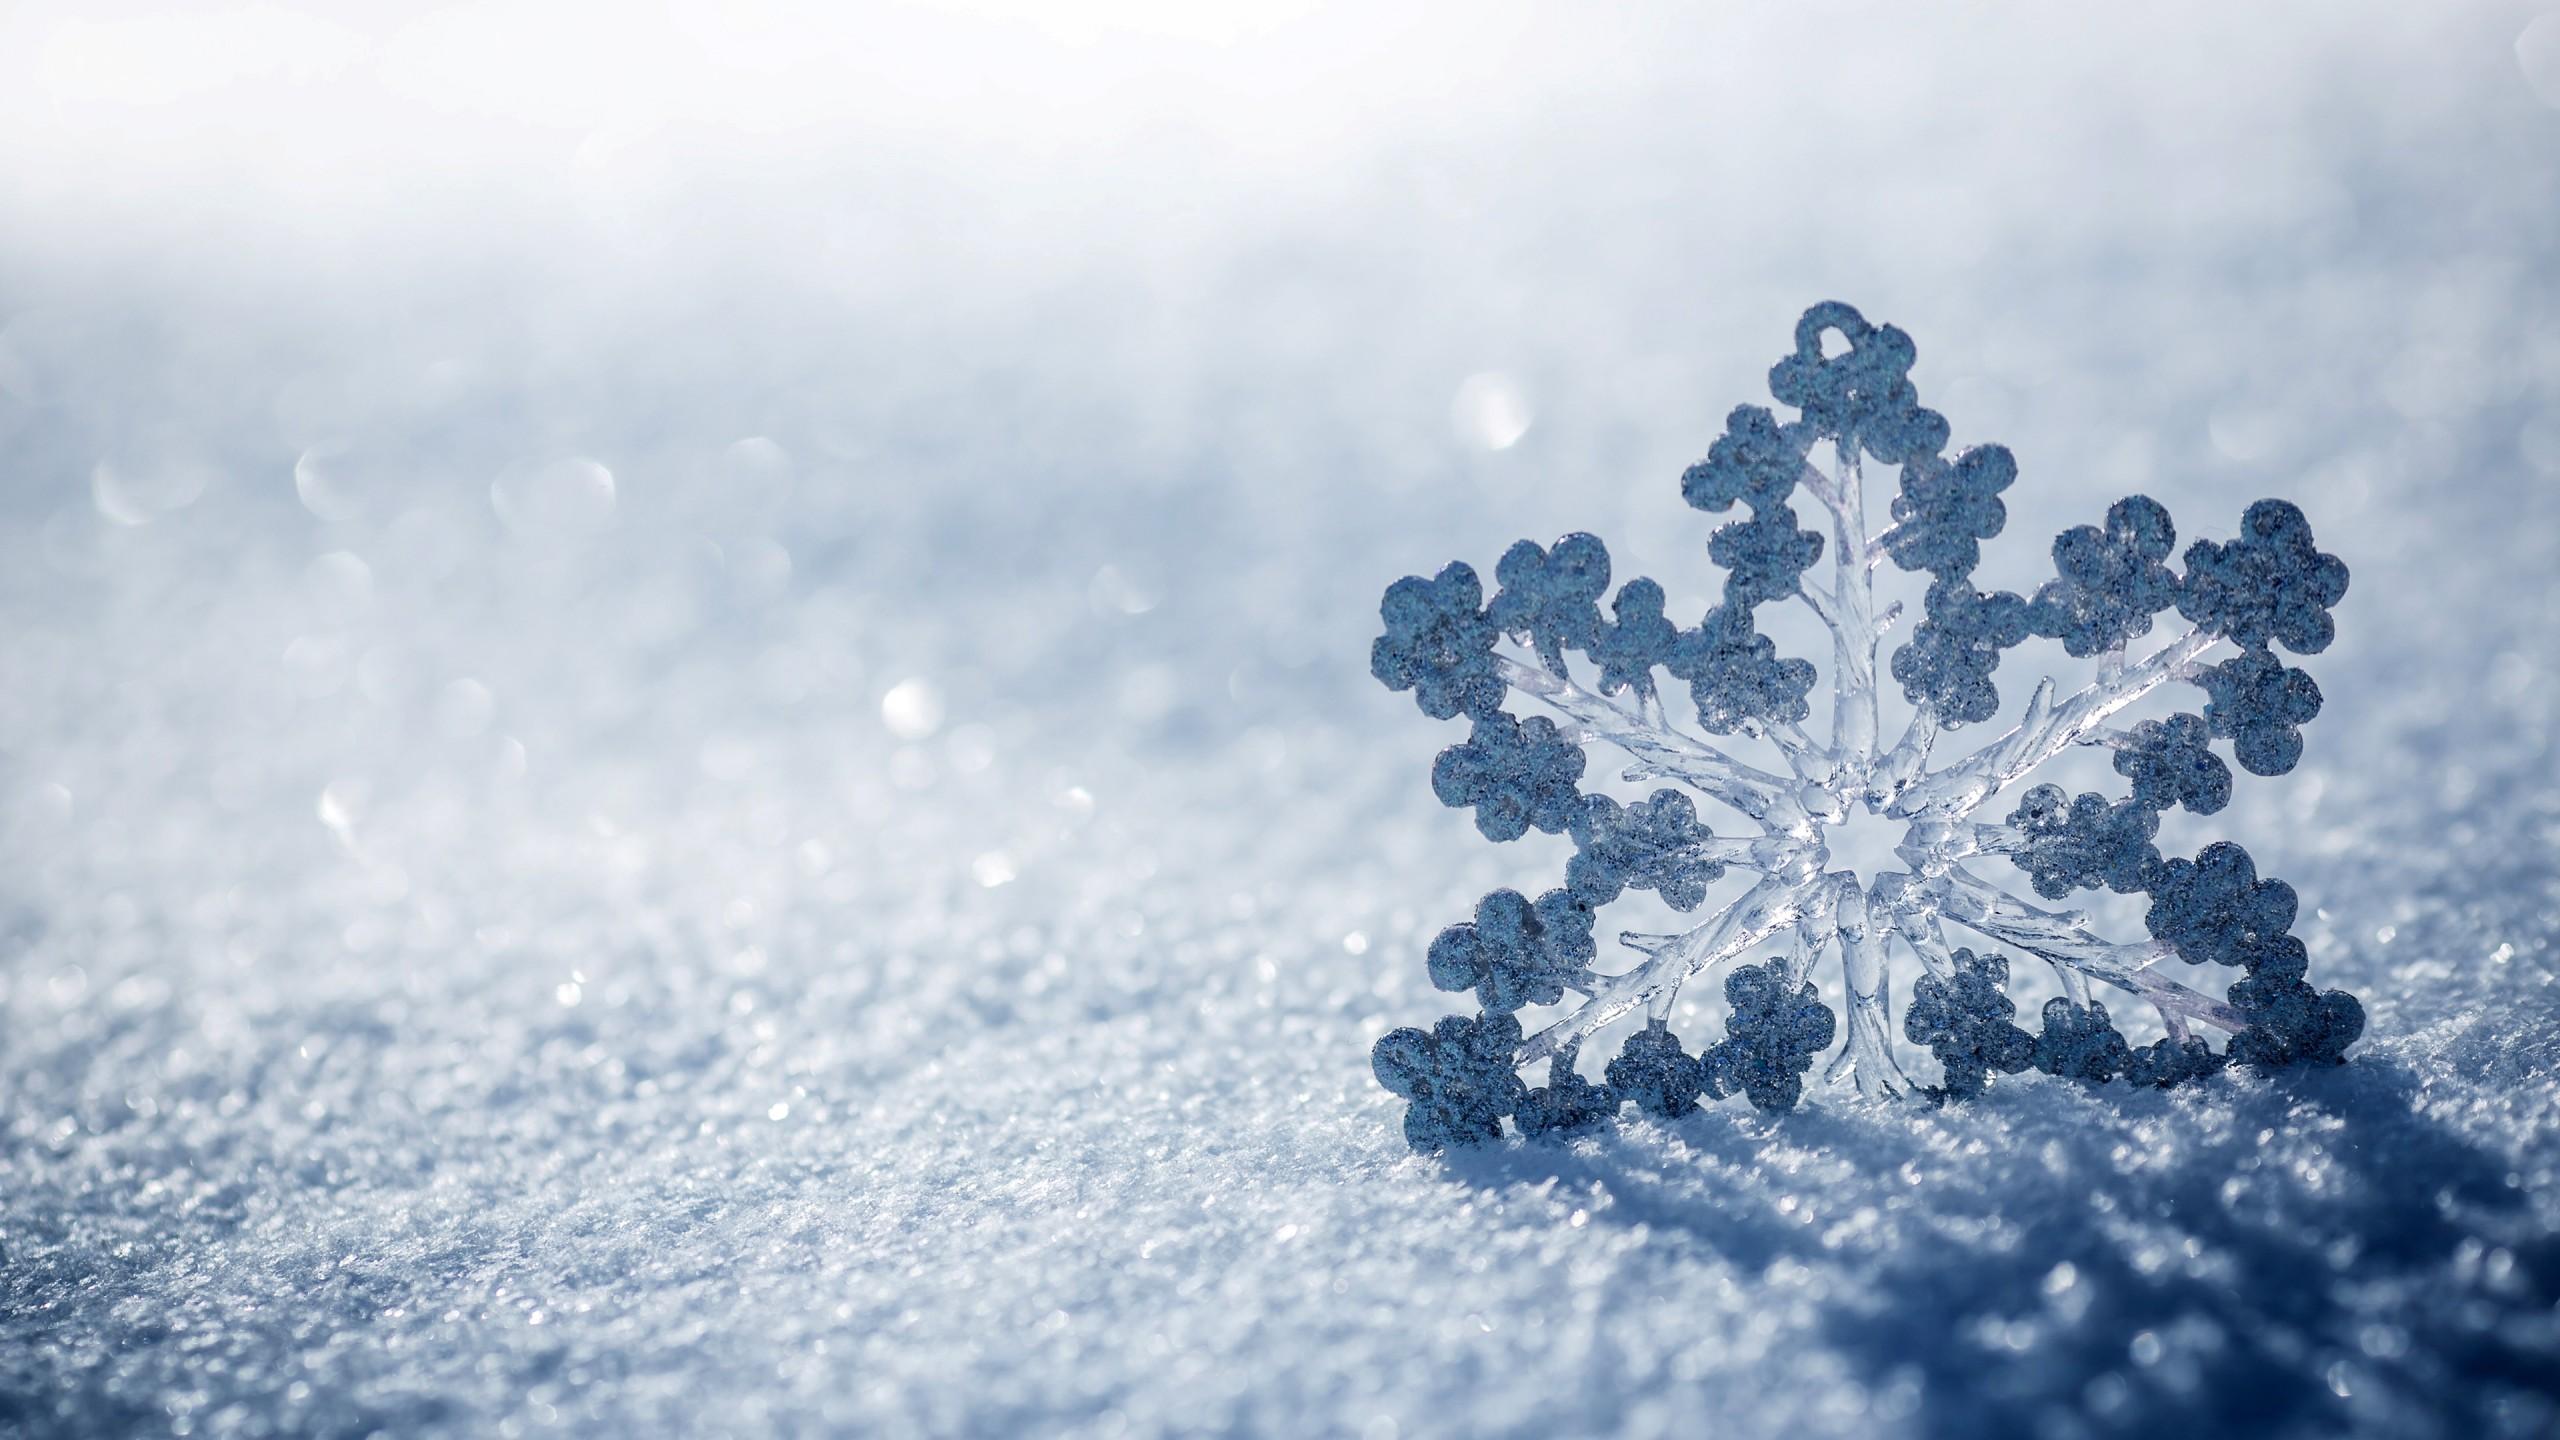 фотографии про снег стоит